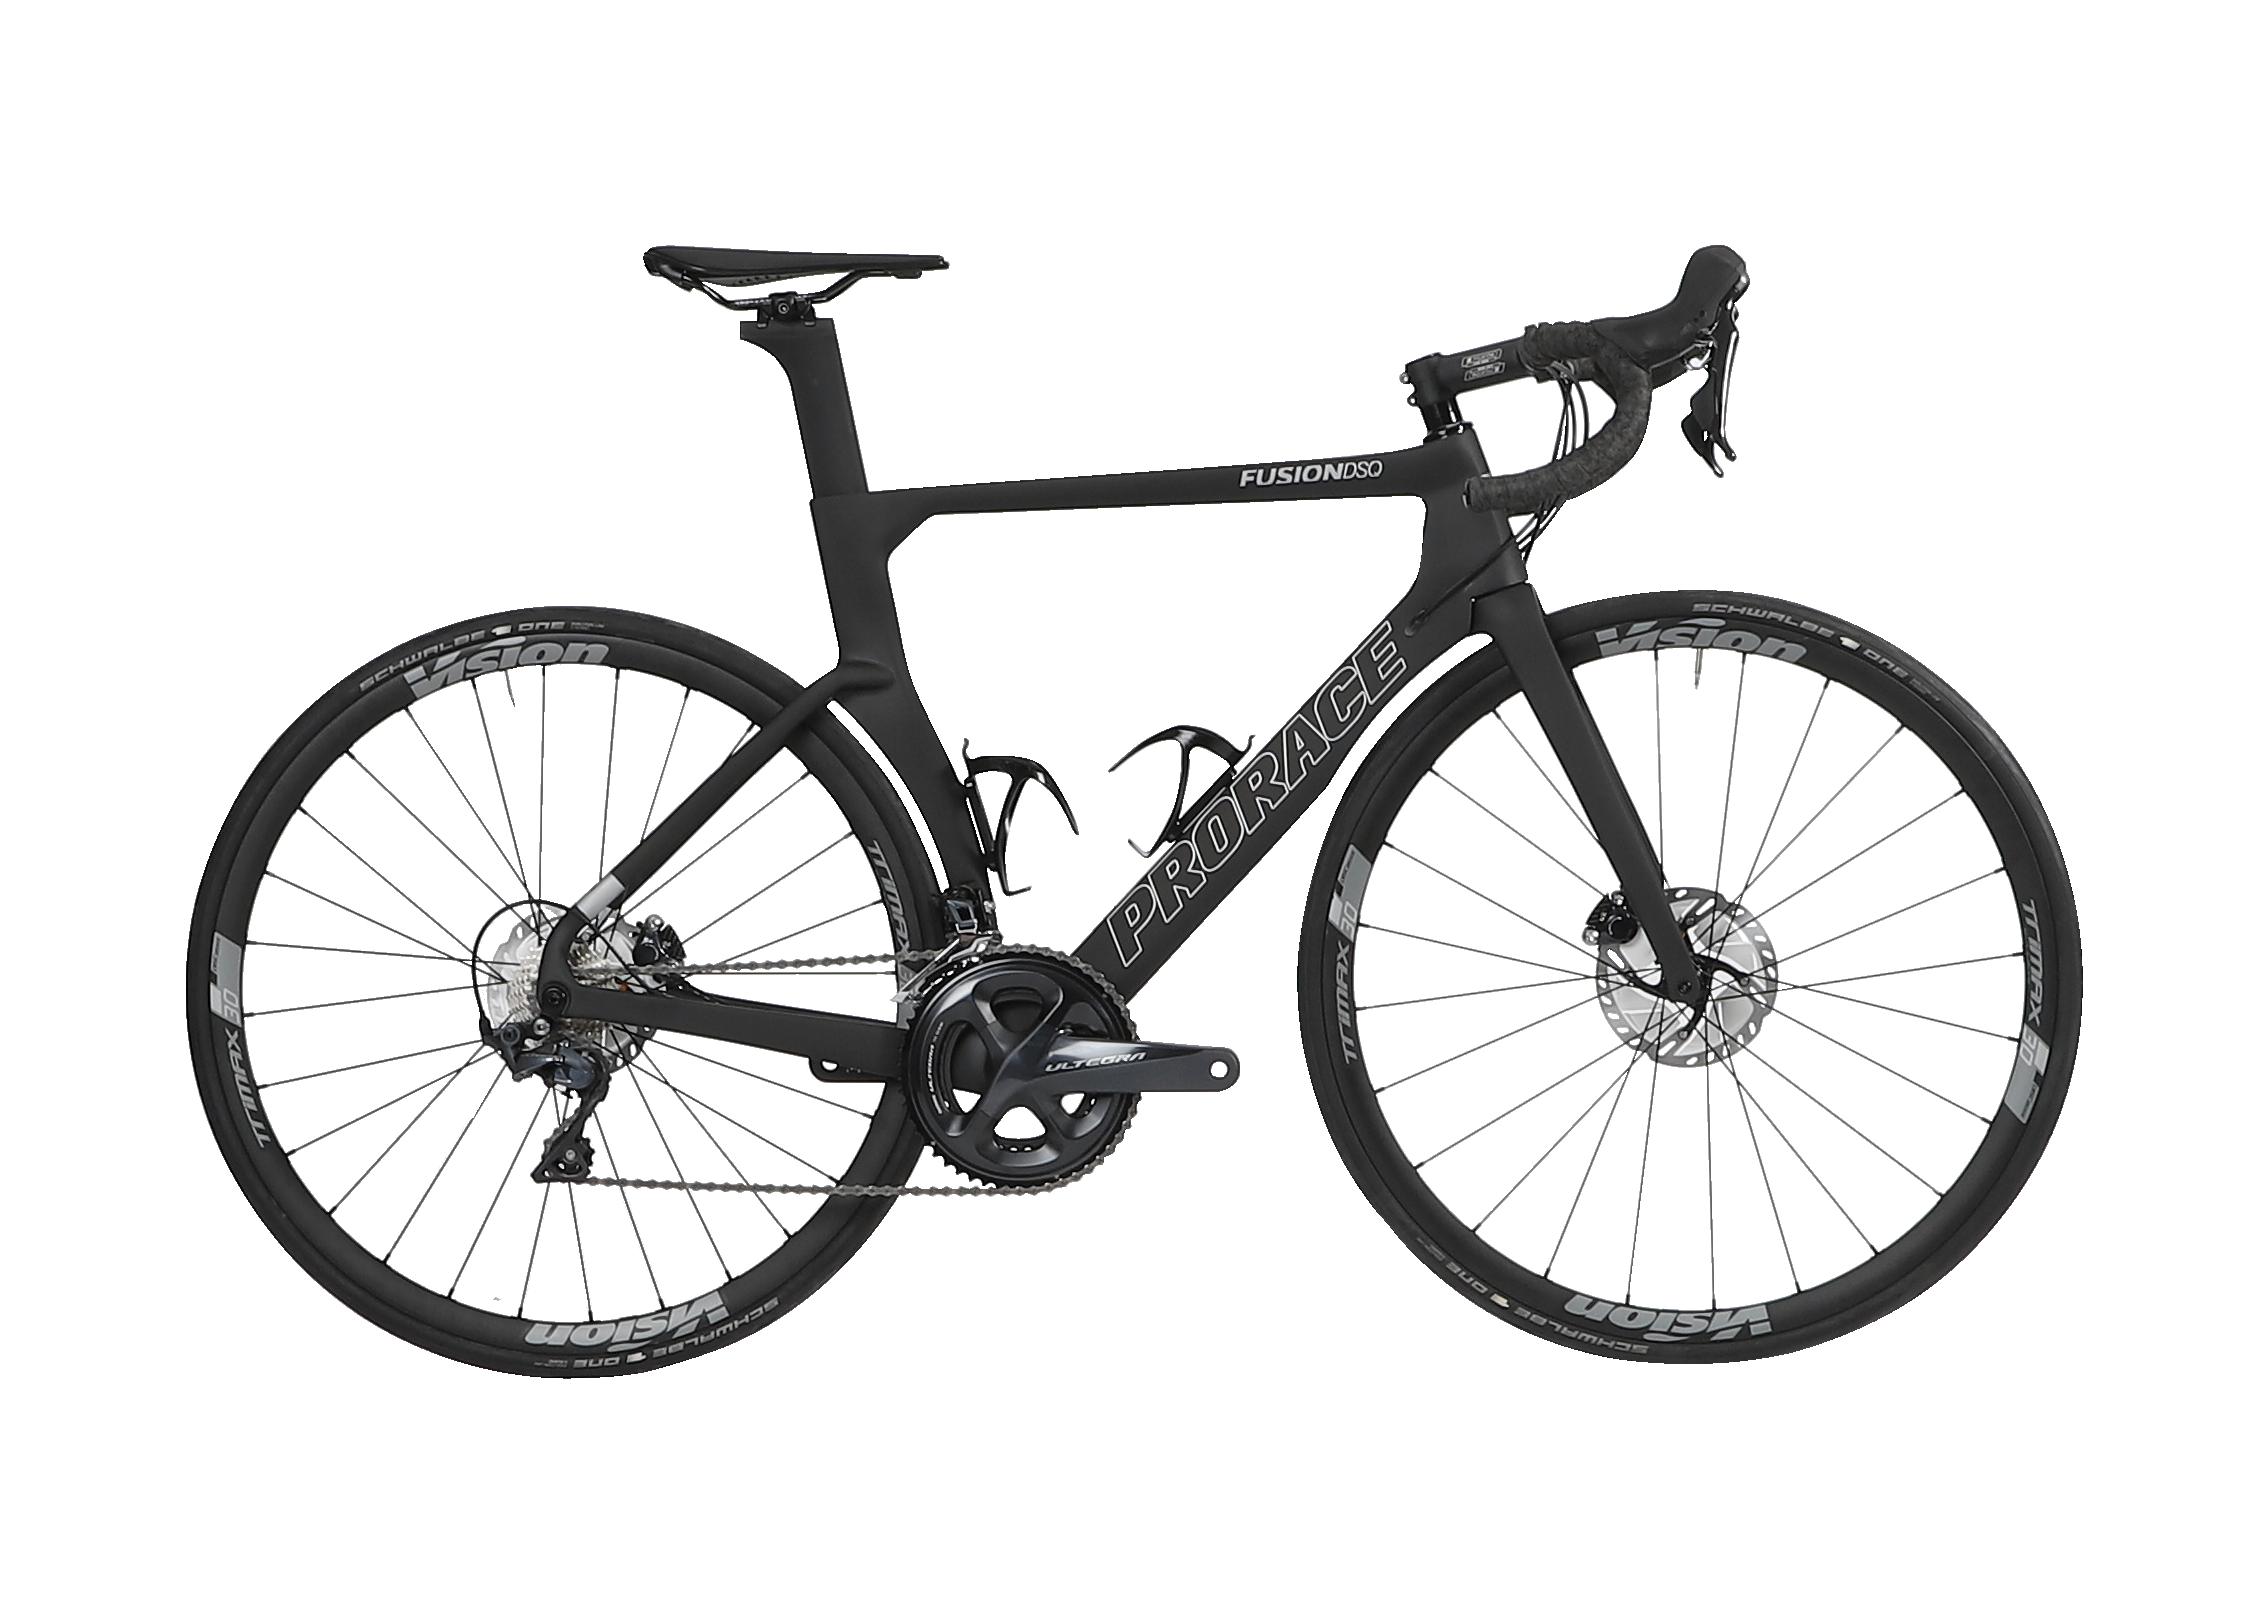 Fusion DSQ aerodynamische Prorace fiets zijaanzicht